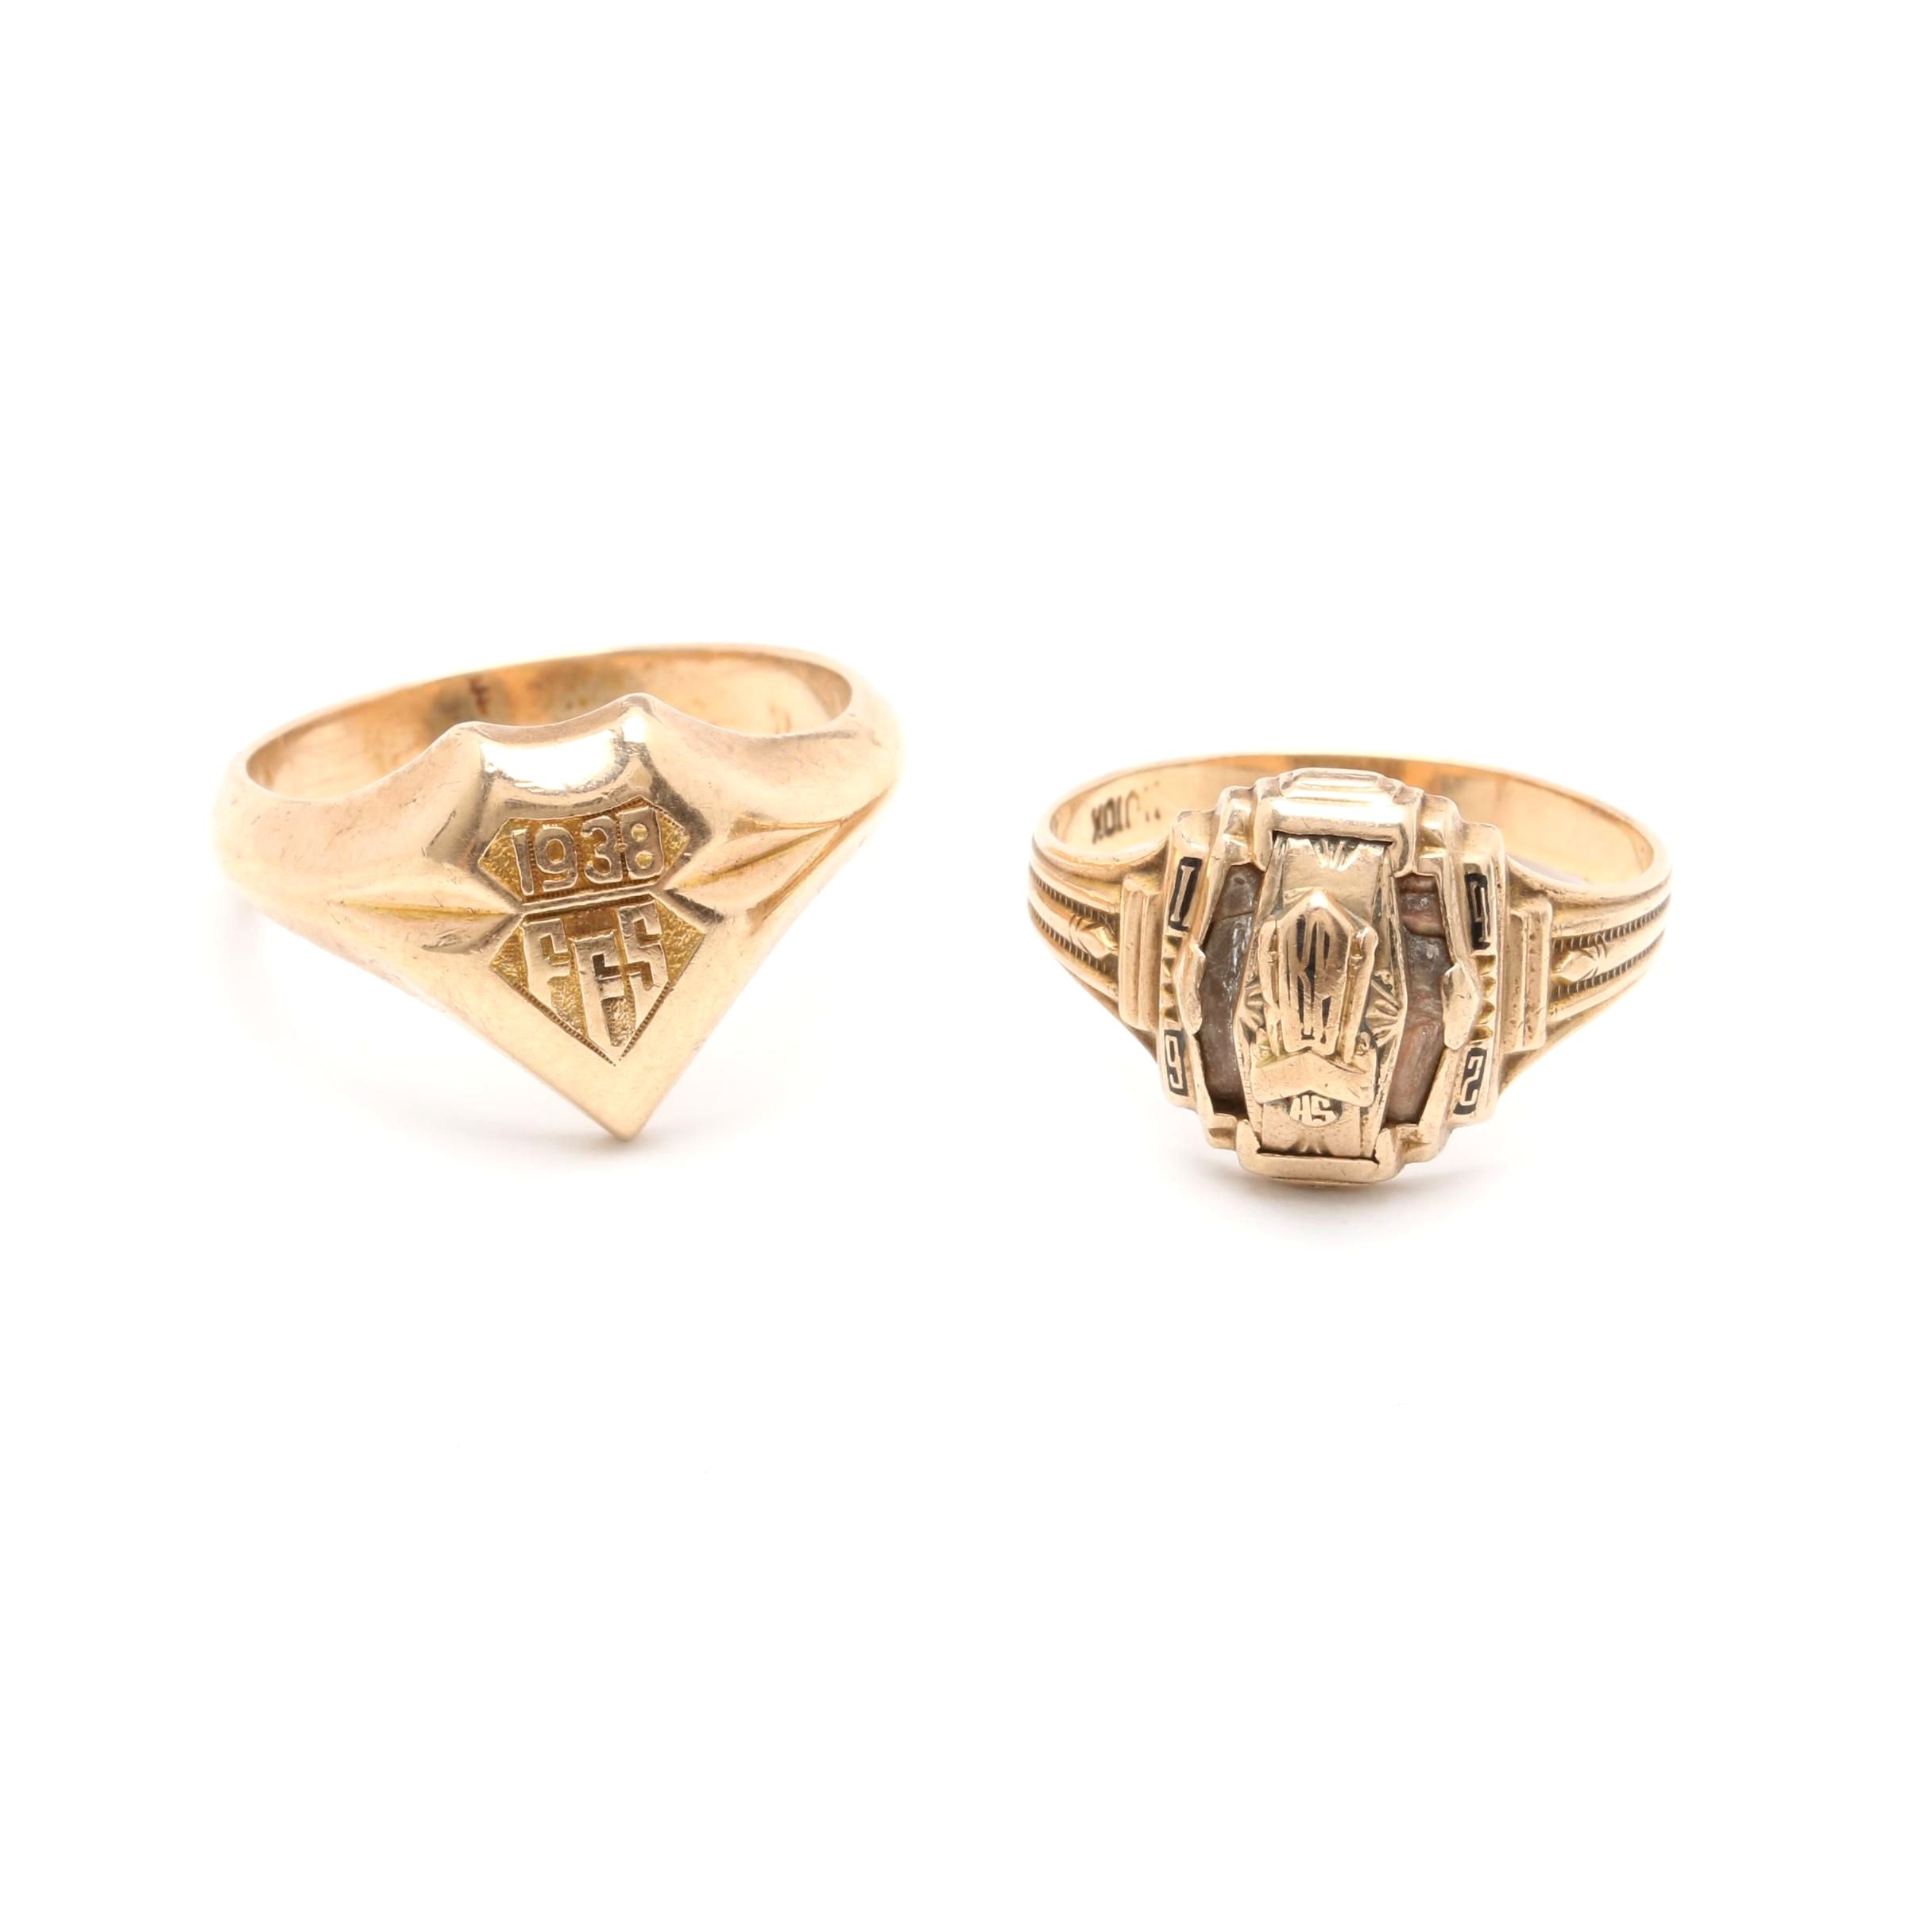 Vintage 10K Yellow Gold Rings